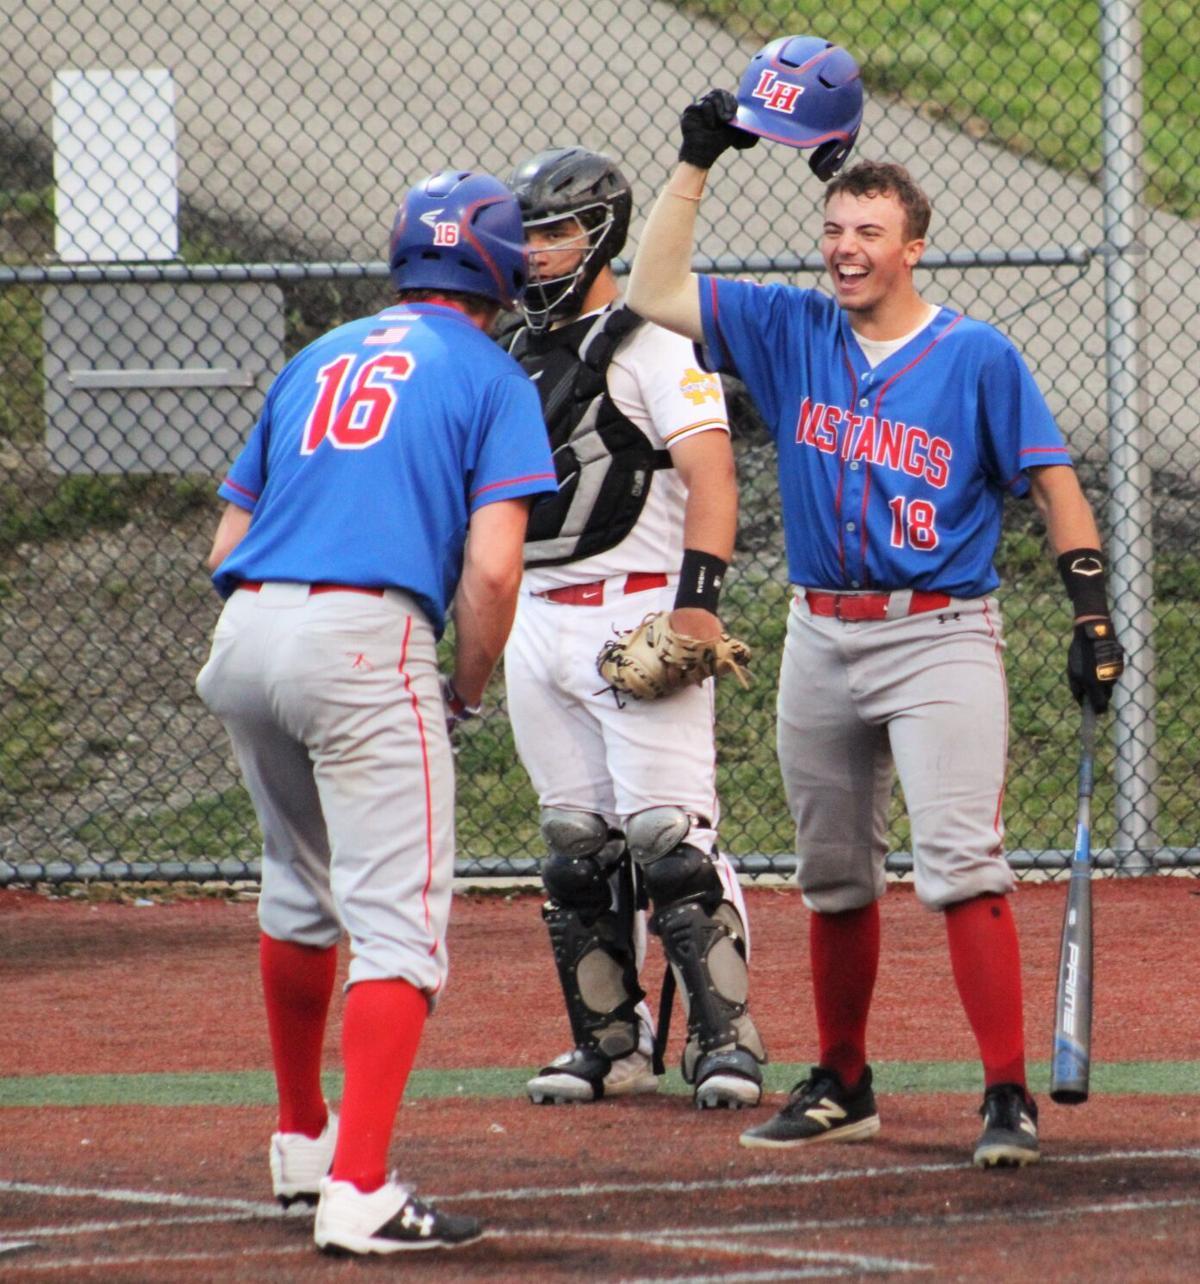 McClain congratulates Kumor after home run